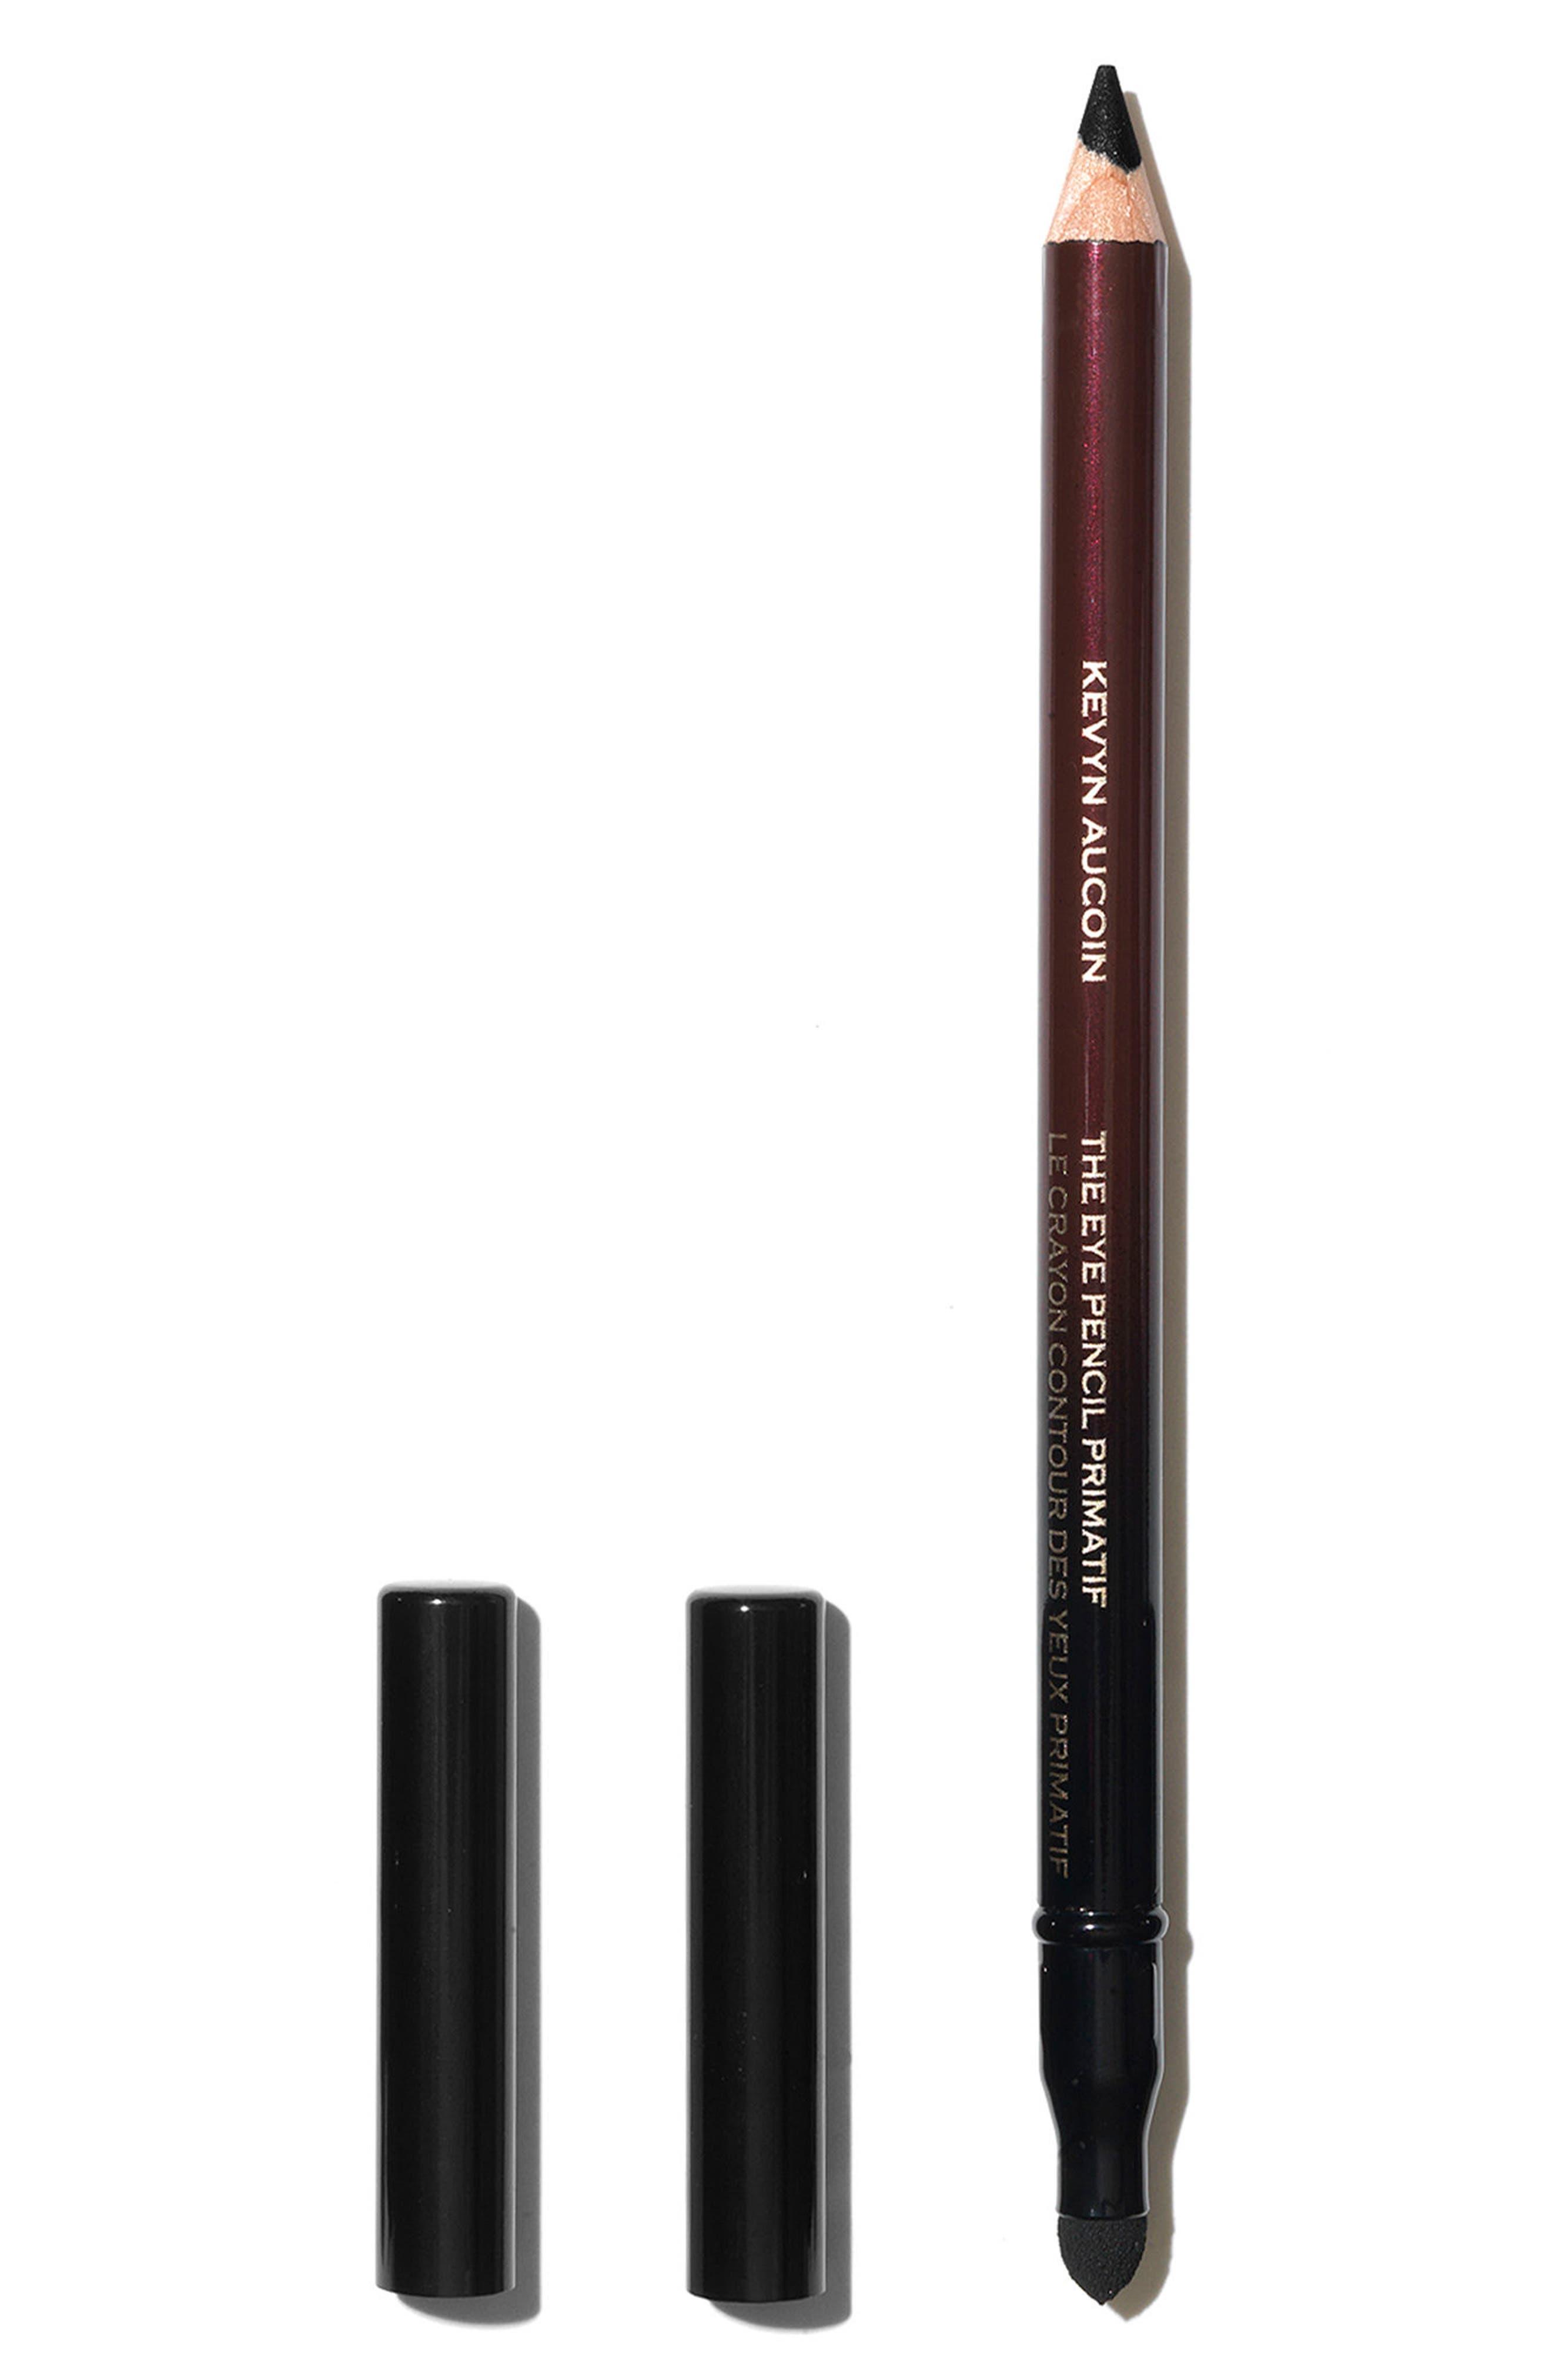 SPACE.NK.apothecary Kevyn Aucoin Beauty The Eye Pencil Primatif Pencil Eyeliner